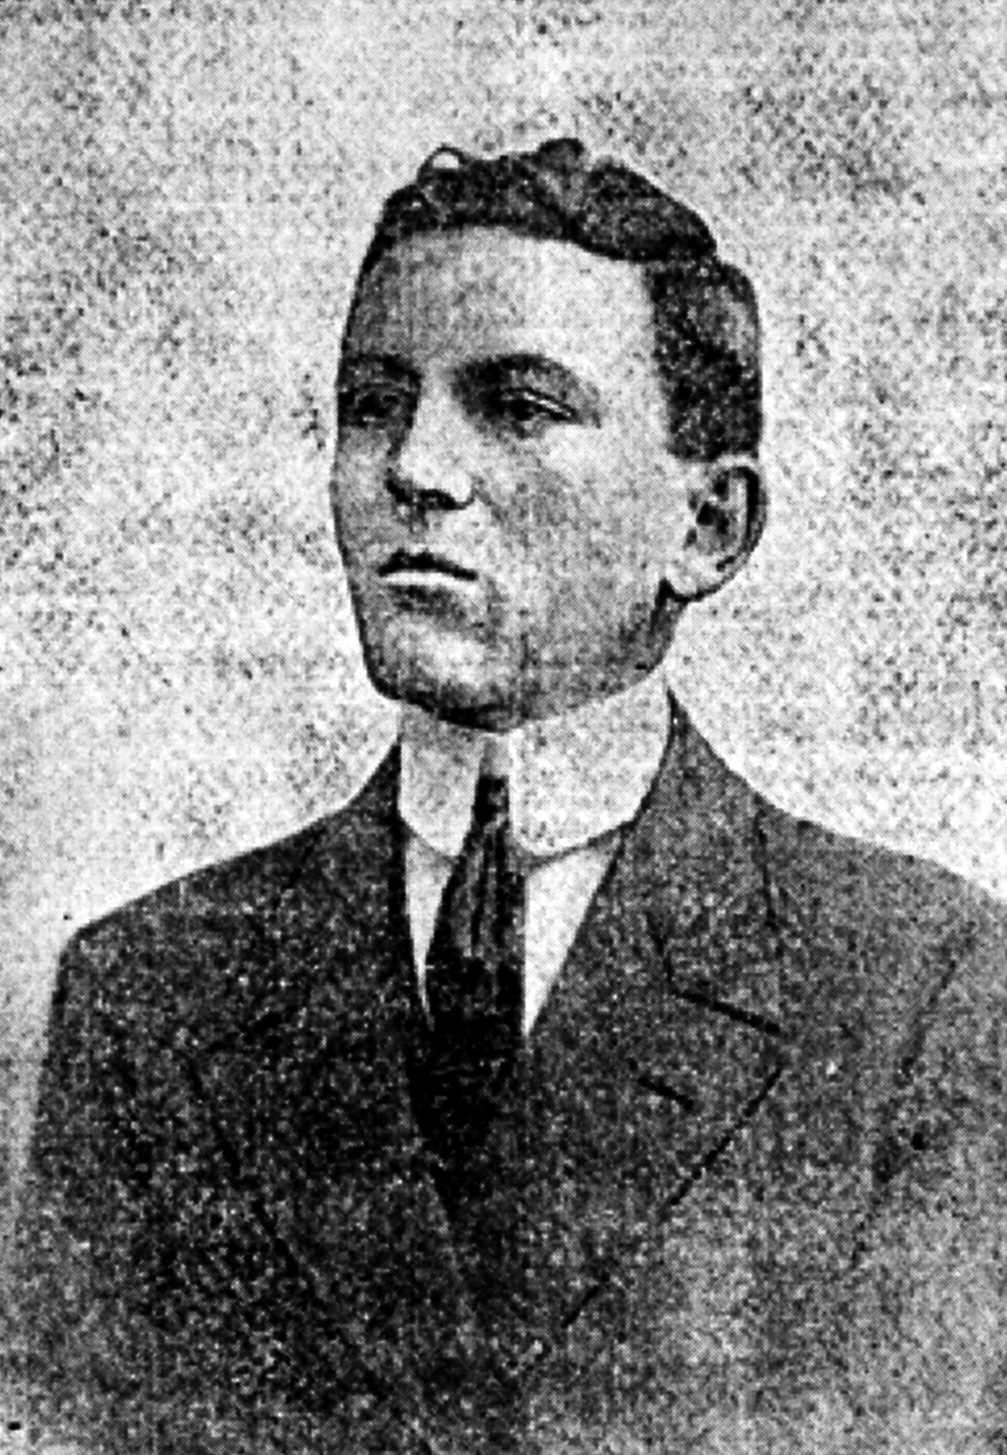 Antonio D'Alba (Vida y obra)